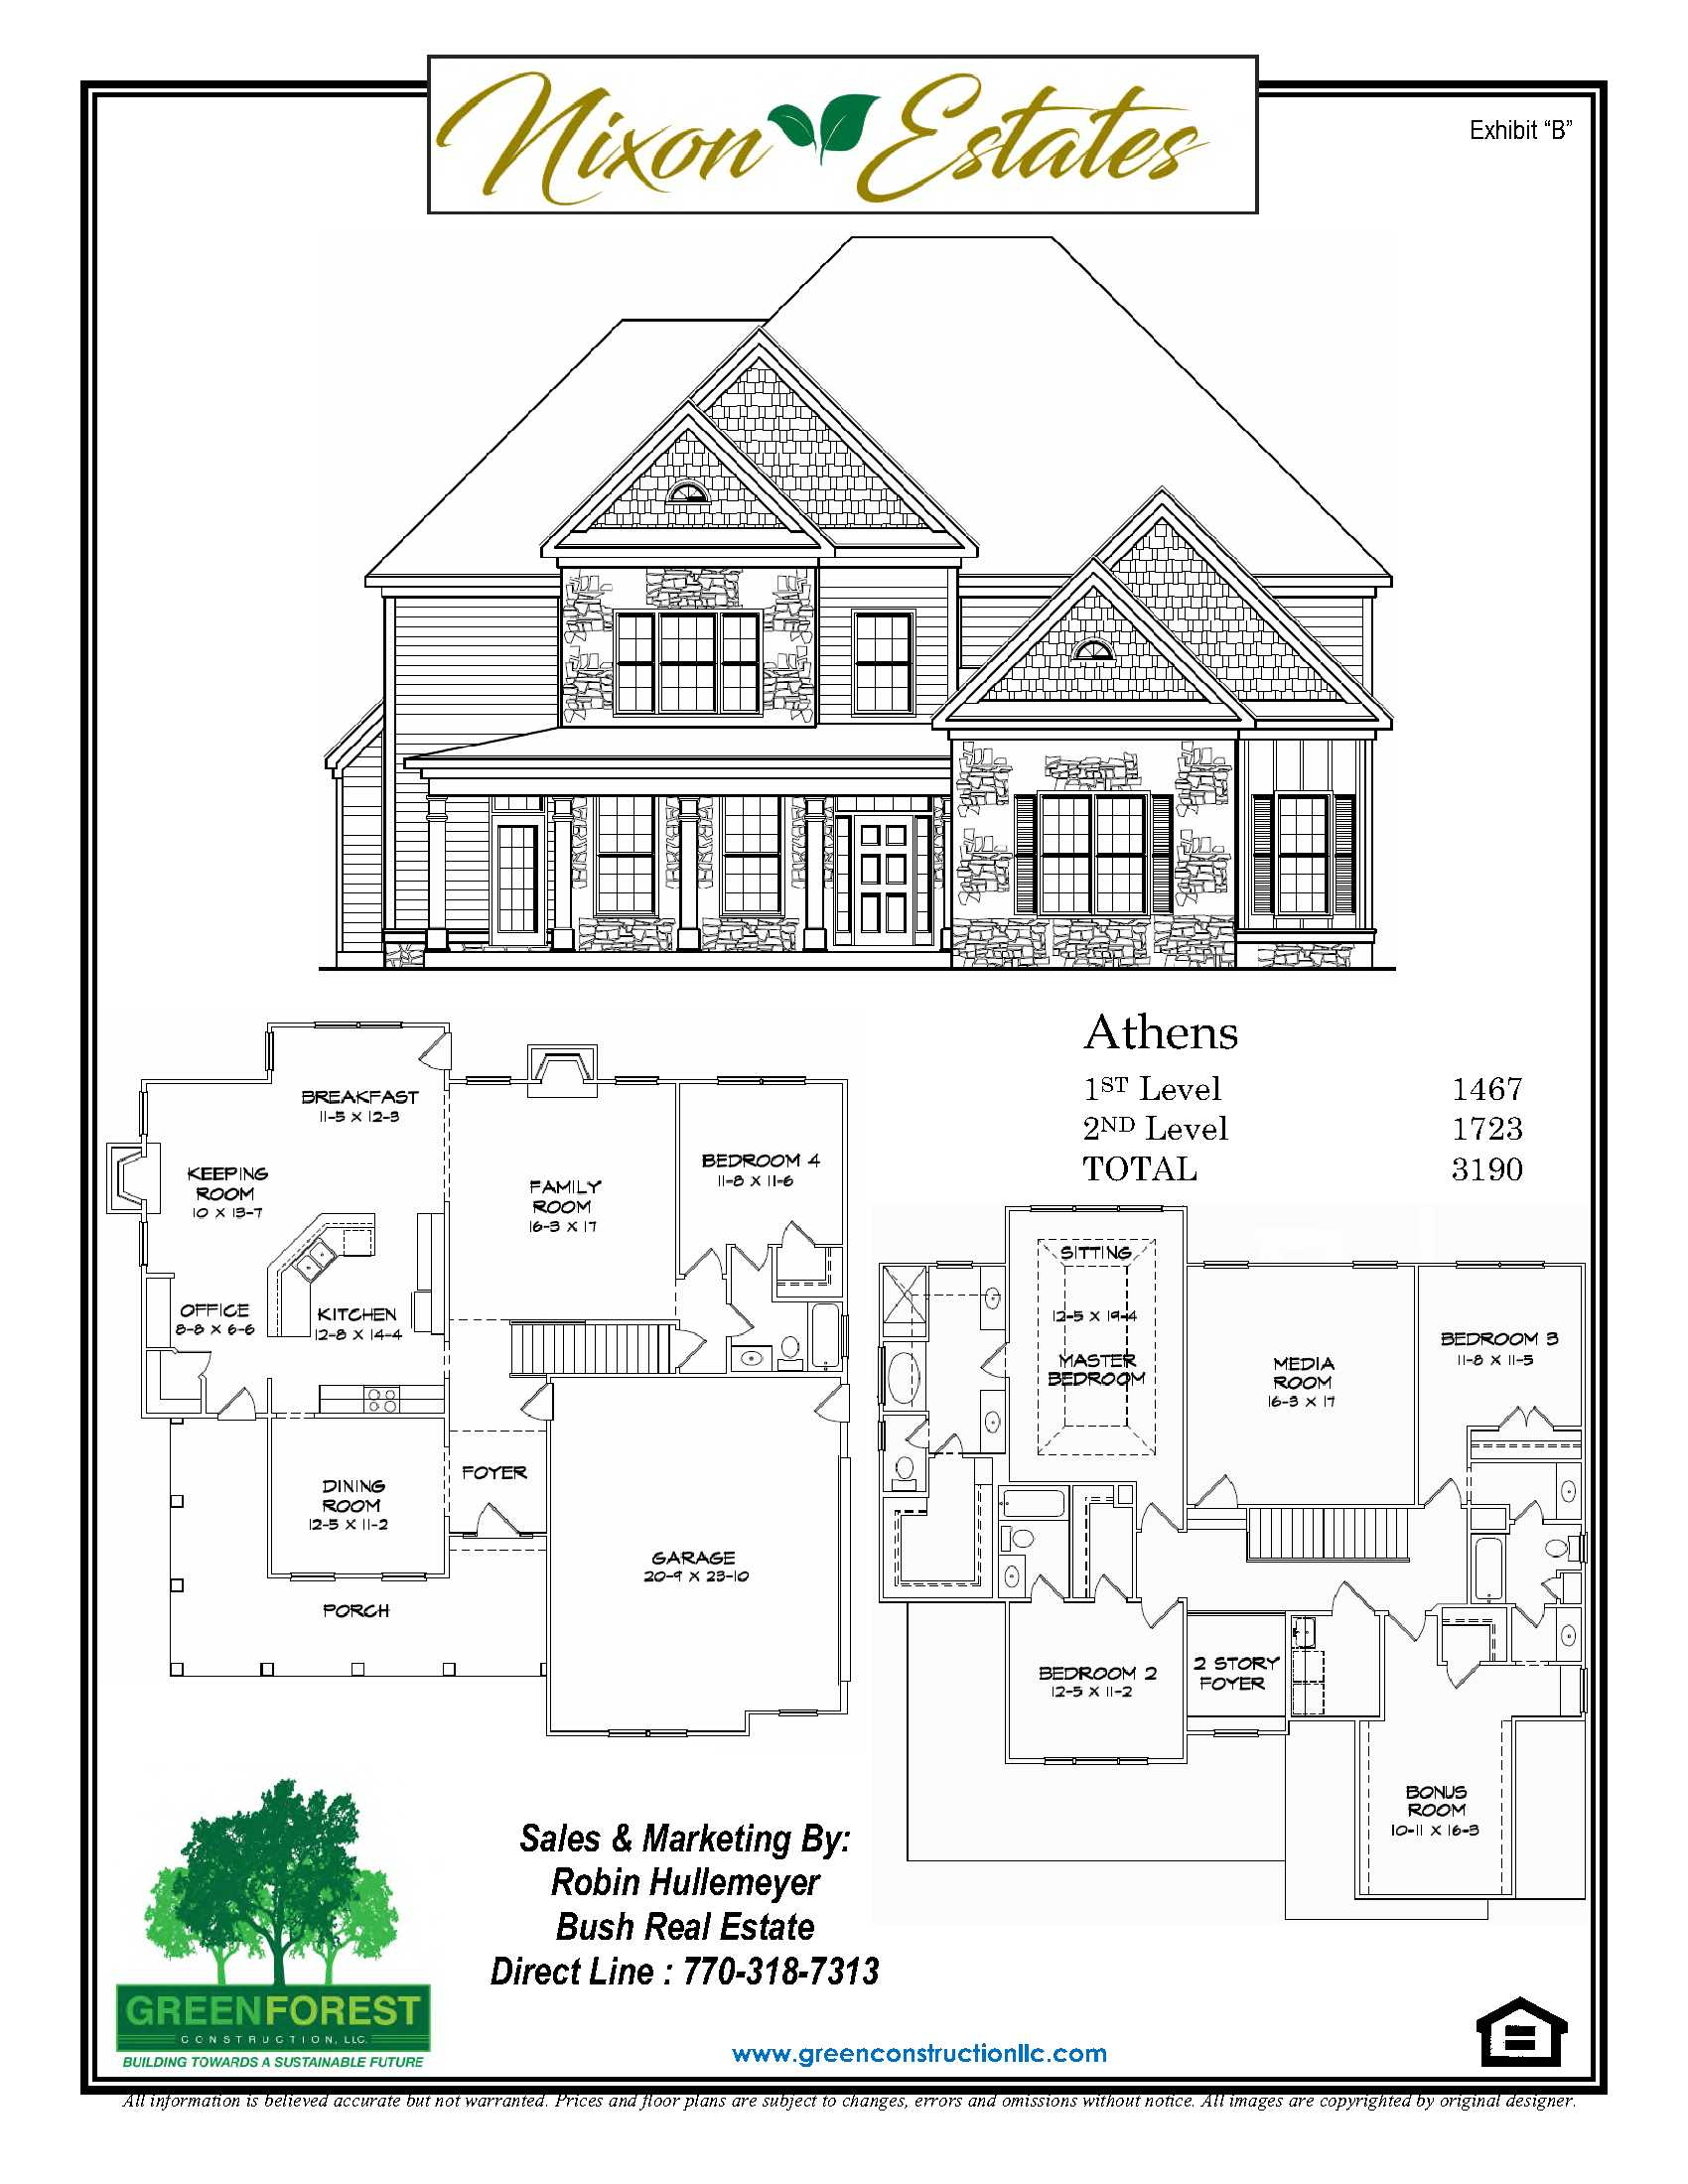 03.13.17 - Nixon Estates Full Package_9.jpg